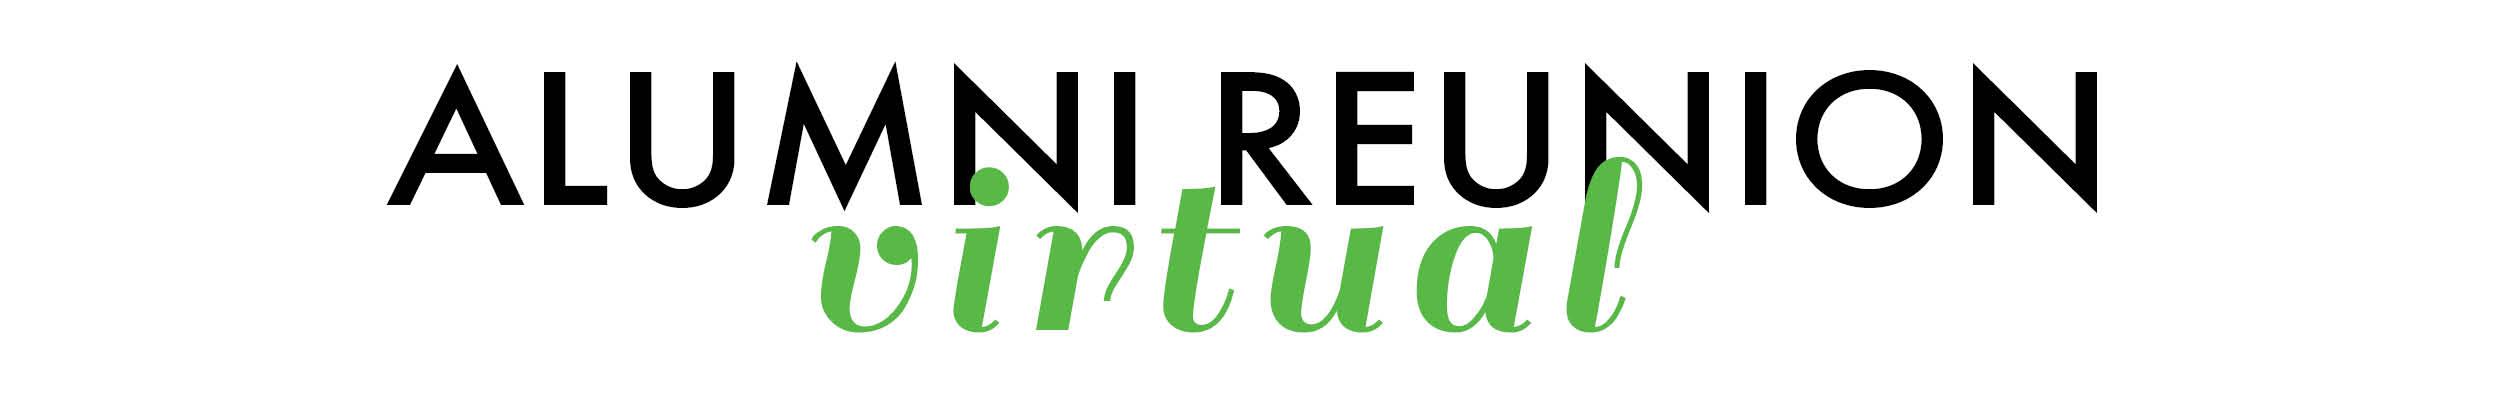 Alumni Reunion Virtual